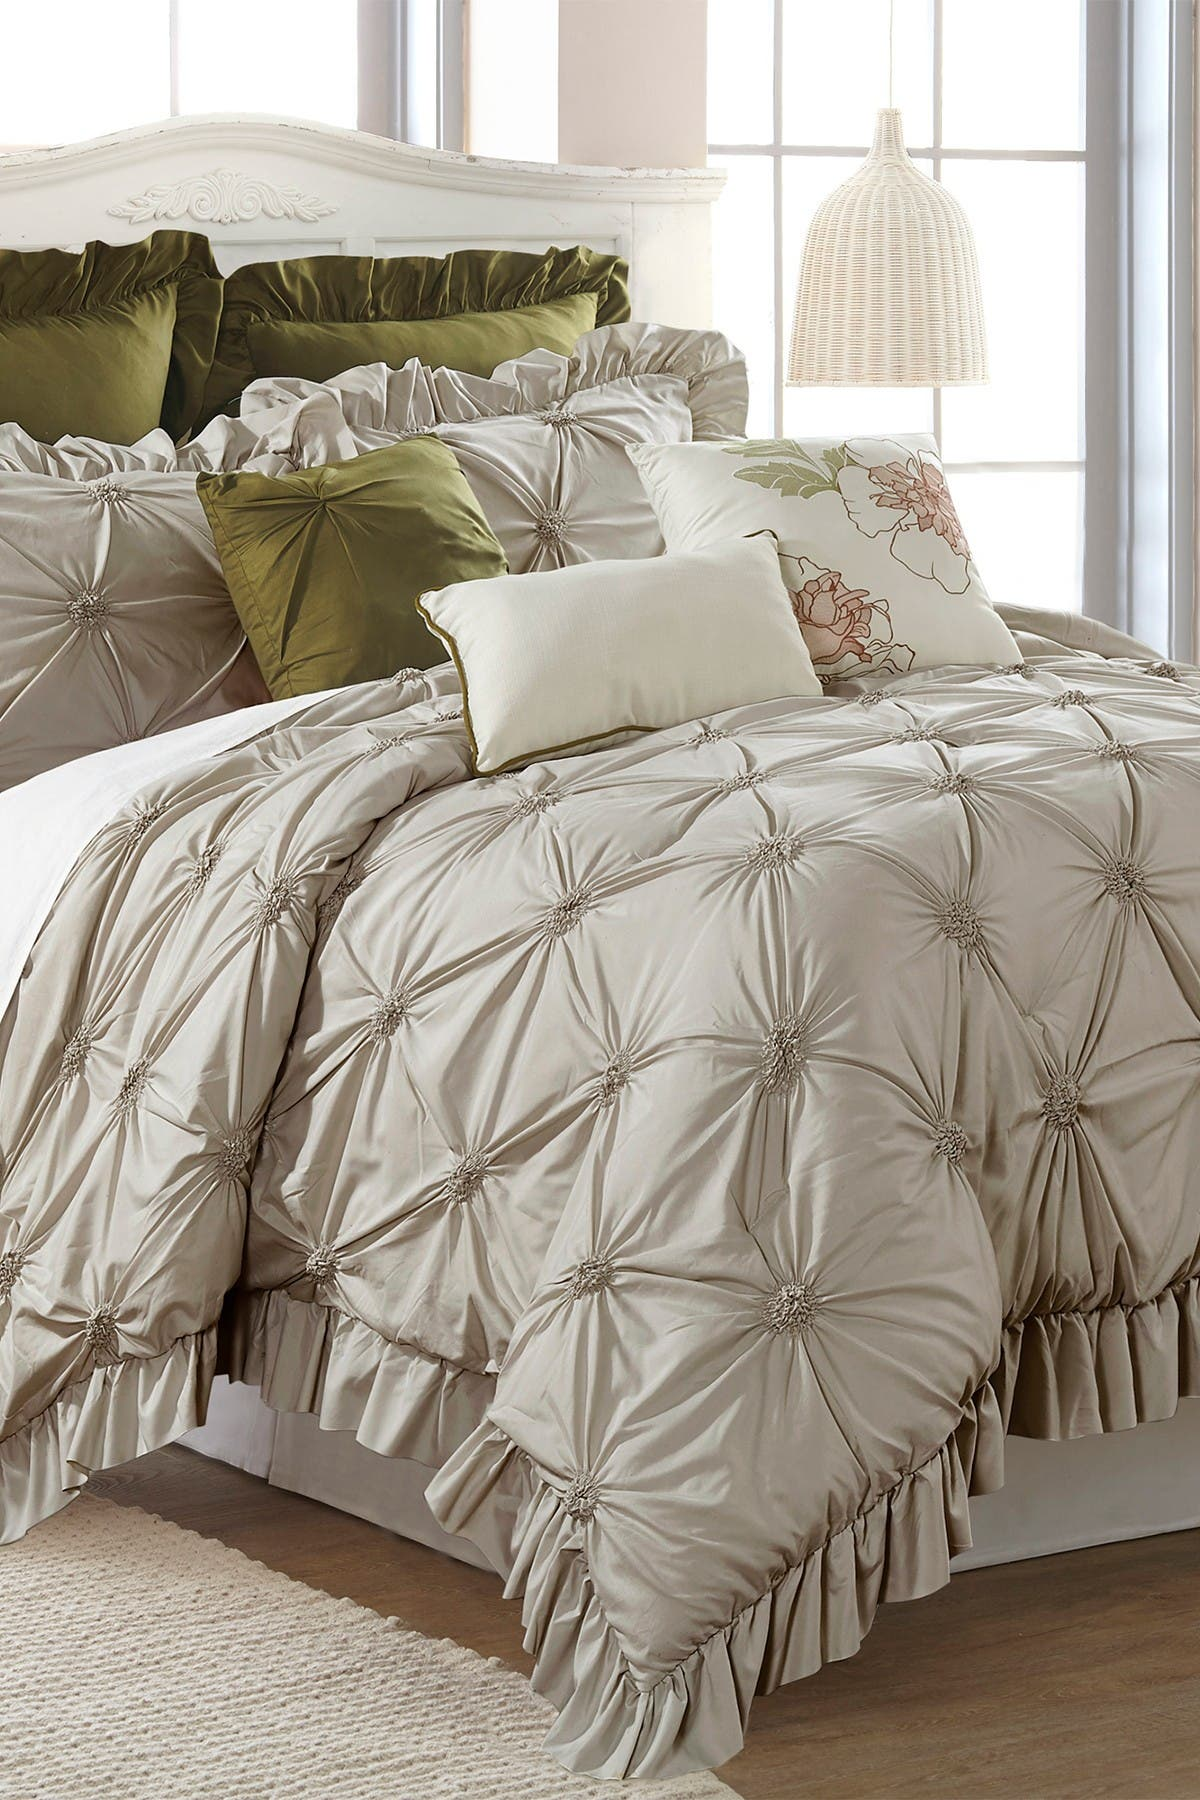 Image of Modern Threads King Caroline Comforter Set - Taupe